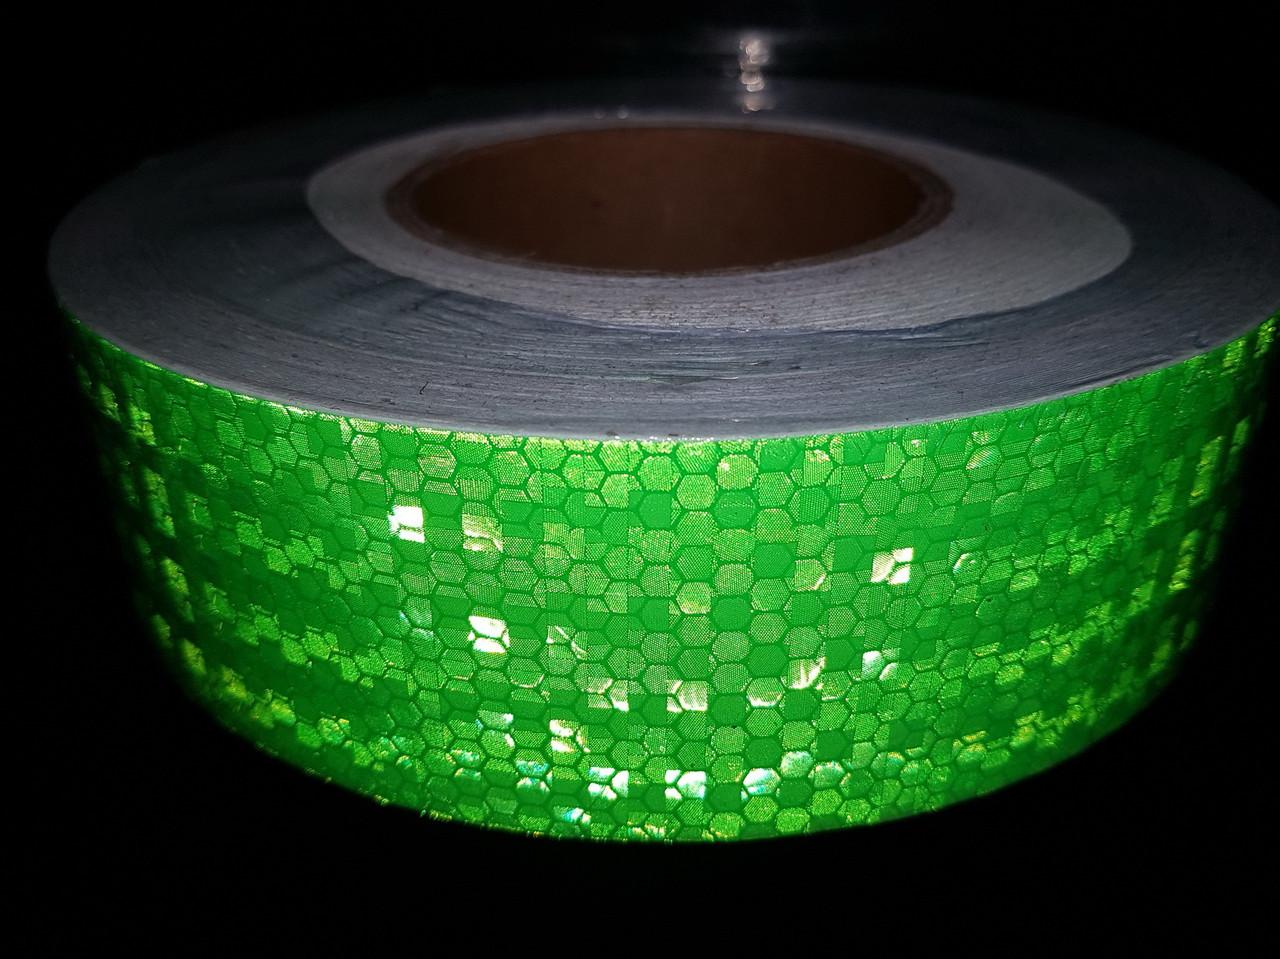 Светоотражающая самоклеящаяся ЗЕЛЕНАЯ лента рулон 50 м, ширина 5 см